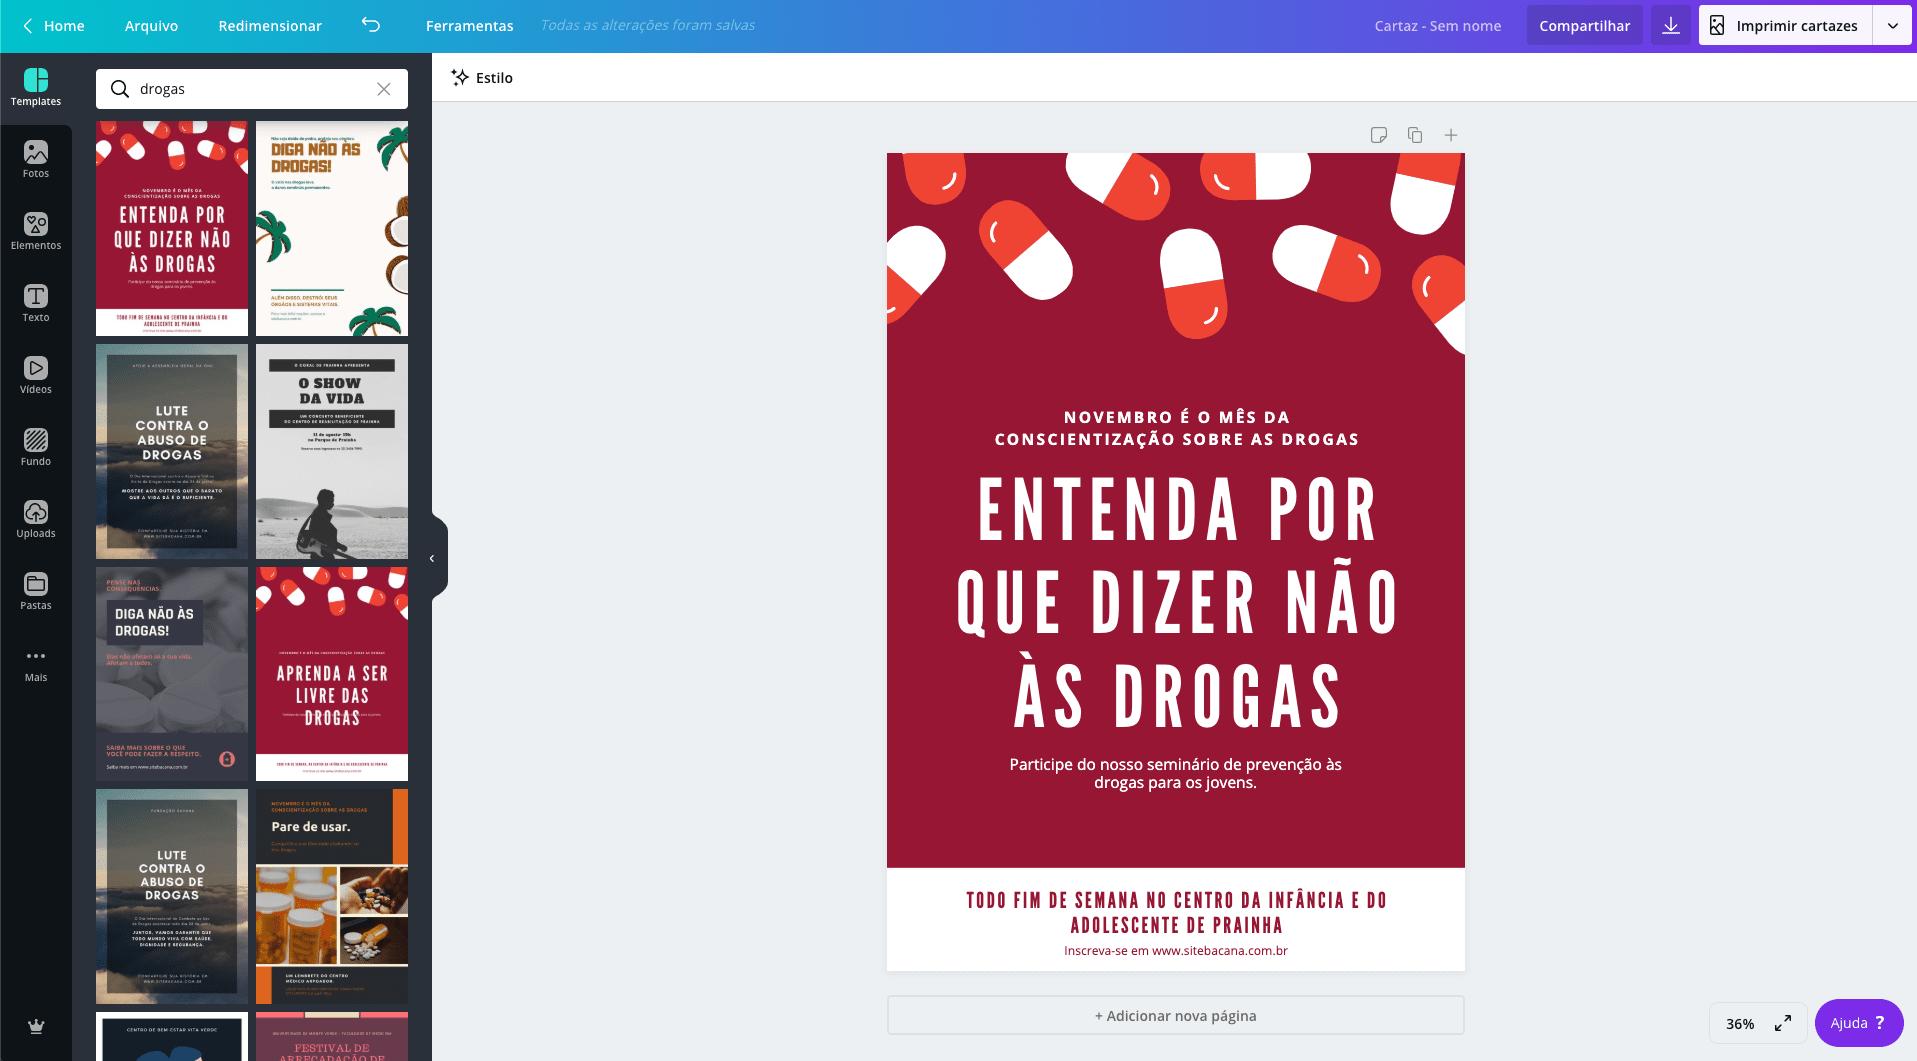 Cartaz para sobre drogas